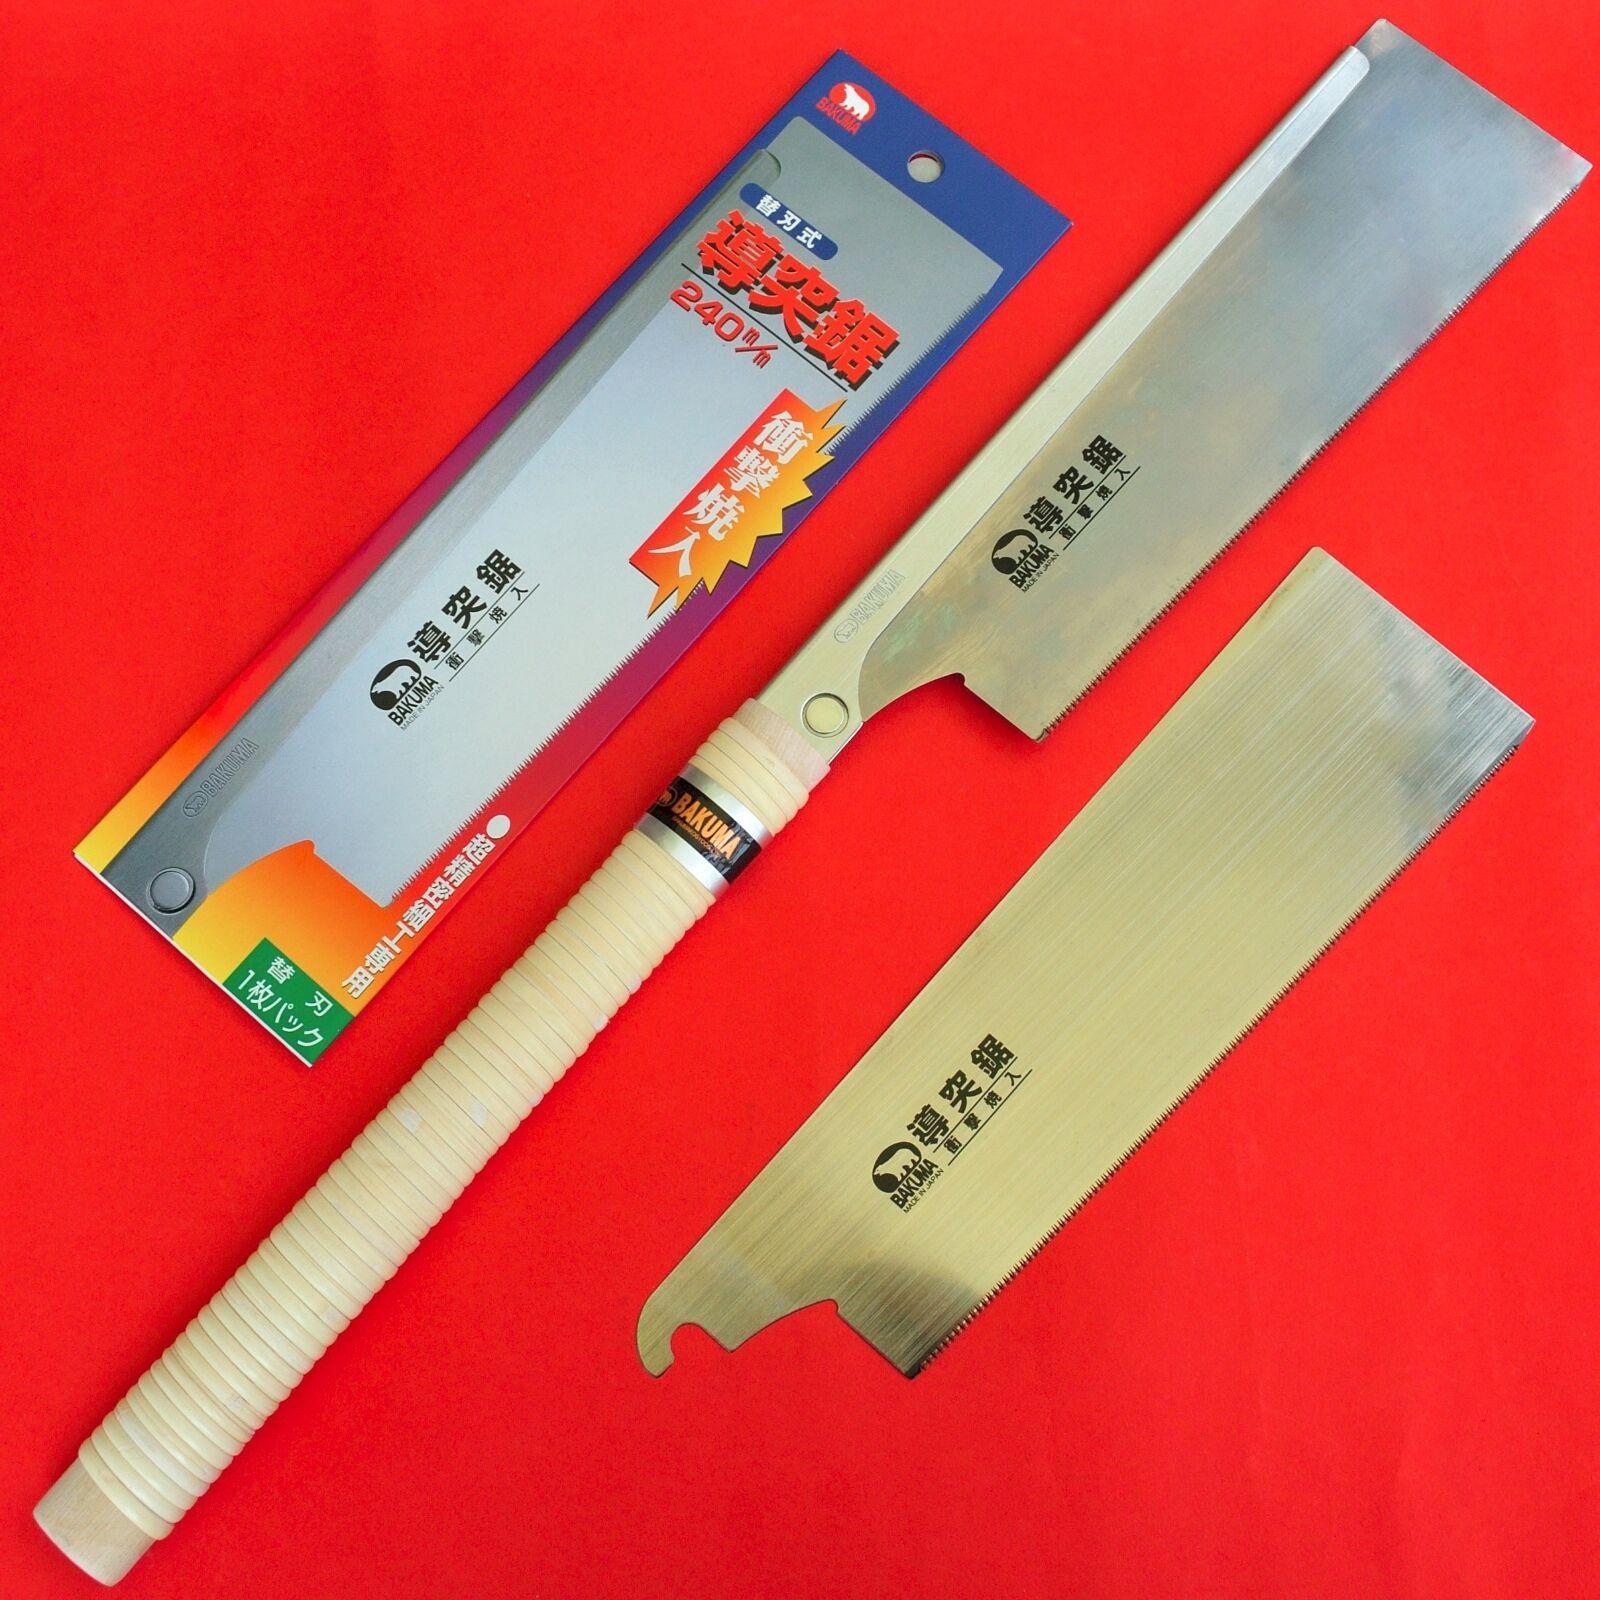 Japan wood BAKUMA DOZUKI Saw + Spare Blade 240mm 0.3mm 10 teeth/cm dovetails